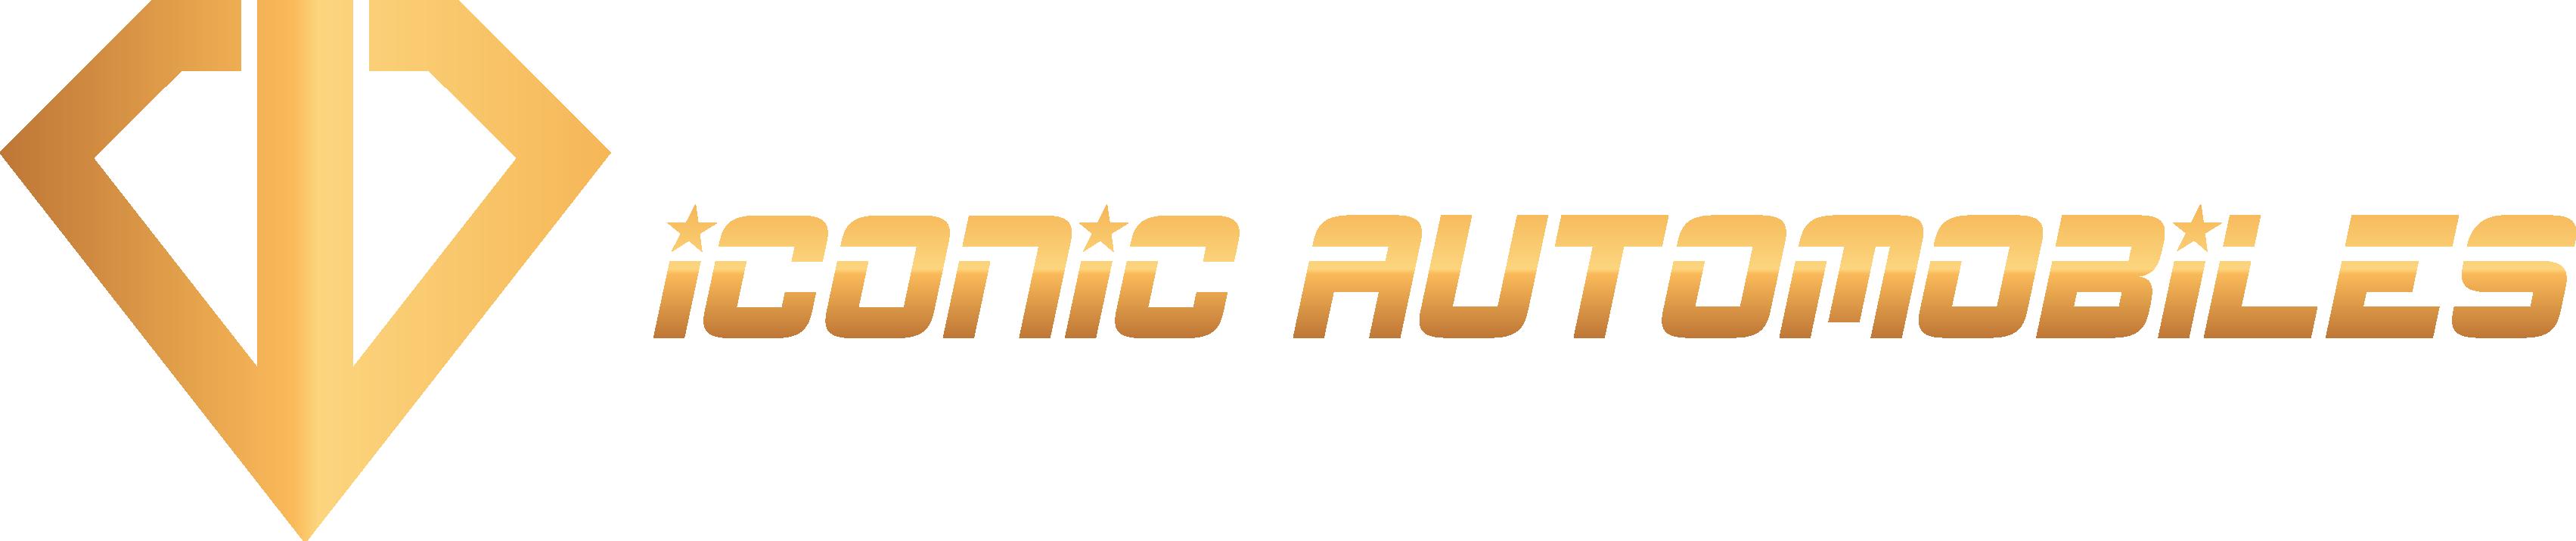 Iconic Automobiles Premium GmbH